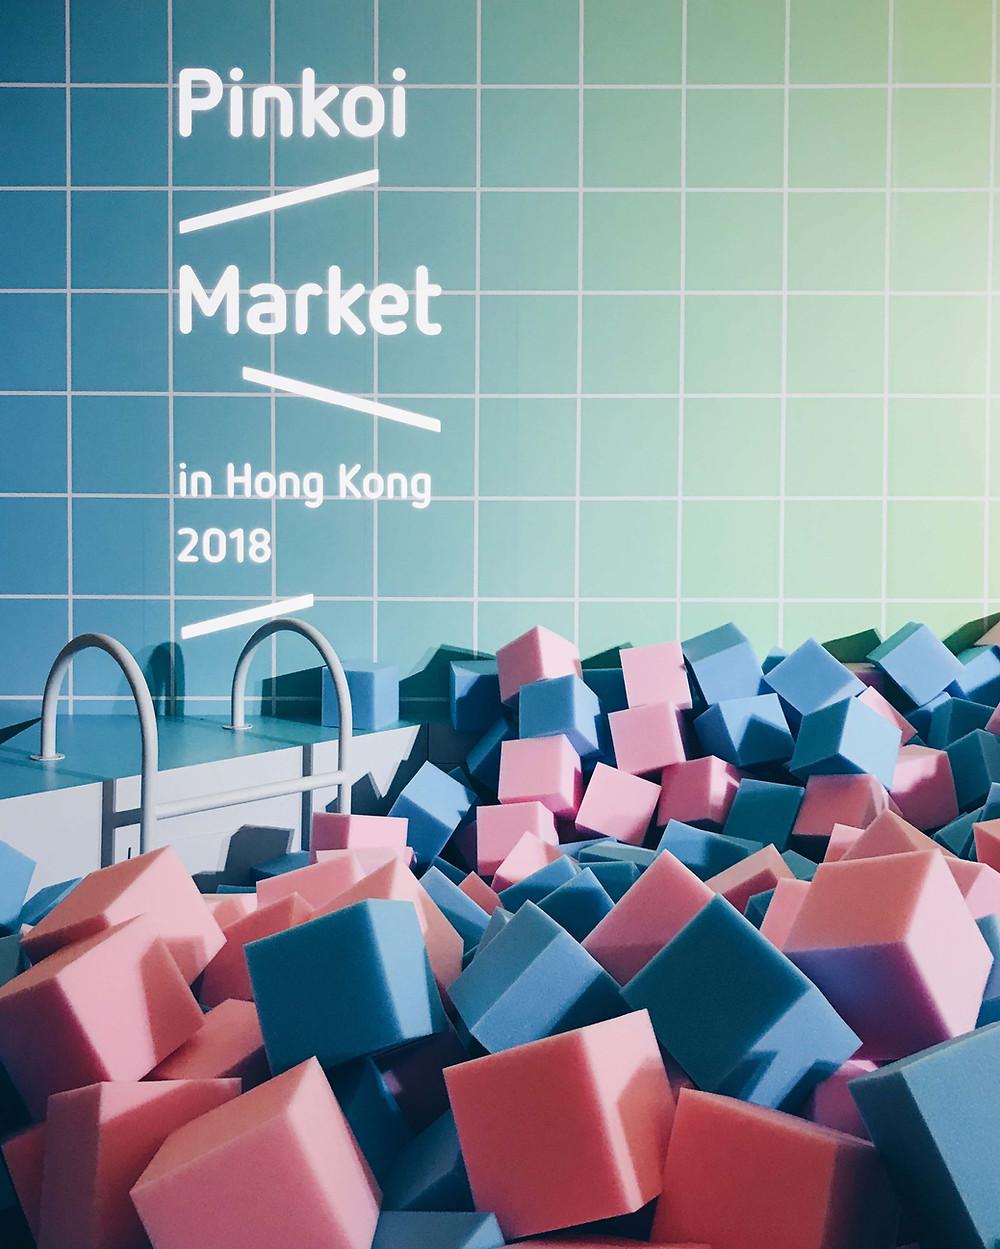 PINKOI MARKET IN HONG KONG 2018 @ THE ANNEX